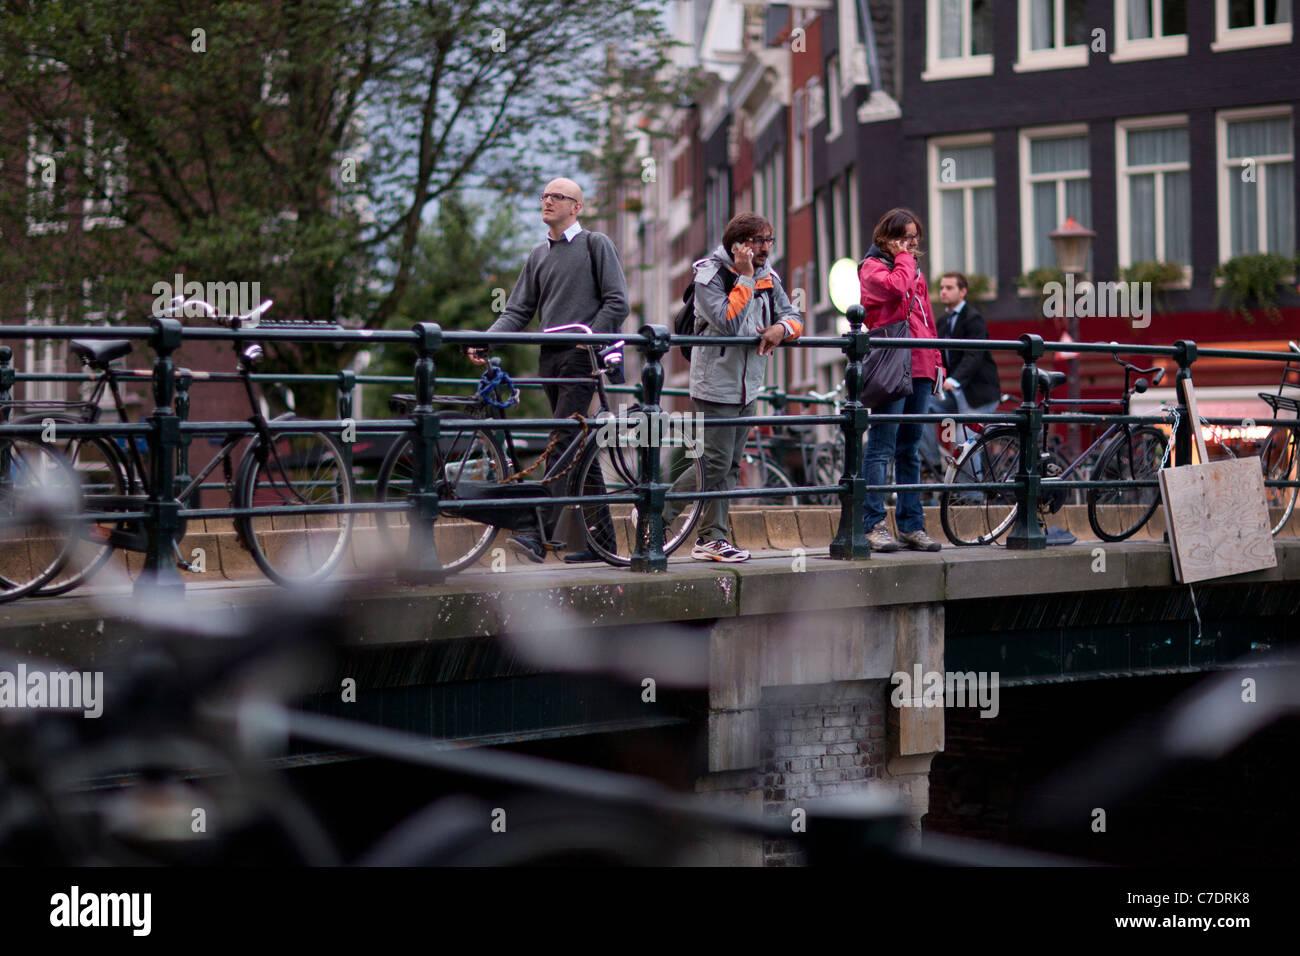 People crossing a bridge in Amsterdam Stock Photo